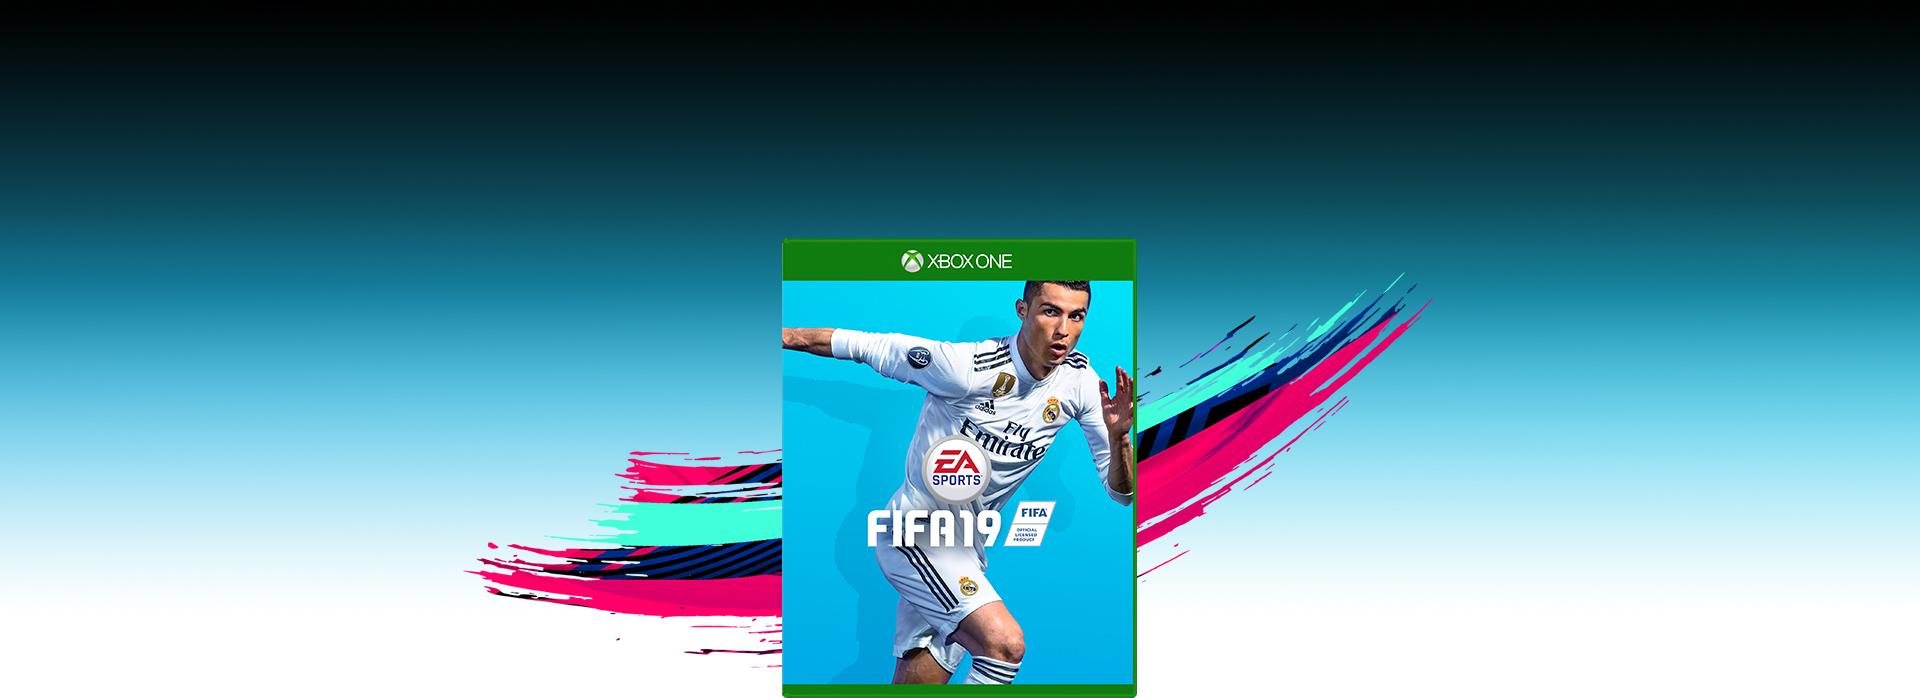 FIFA19-coverbillede